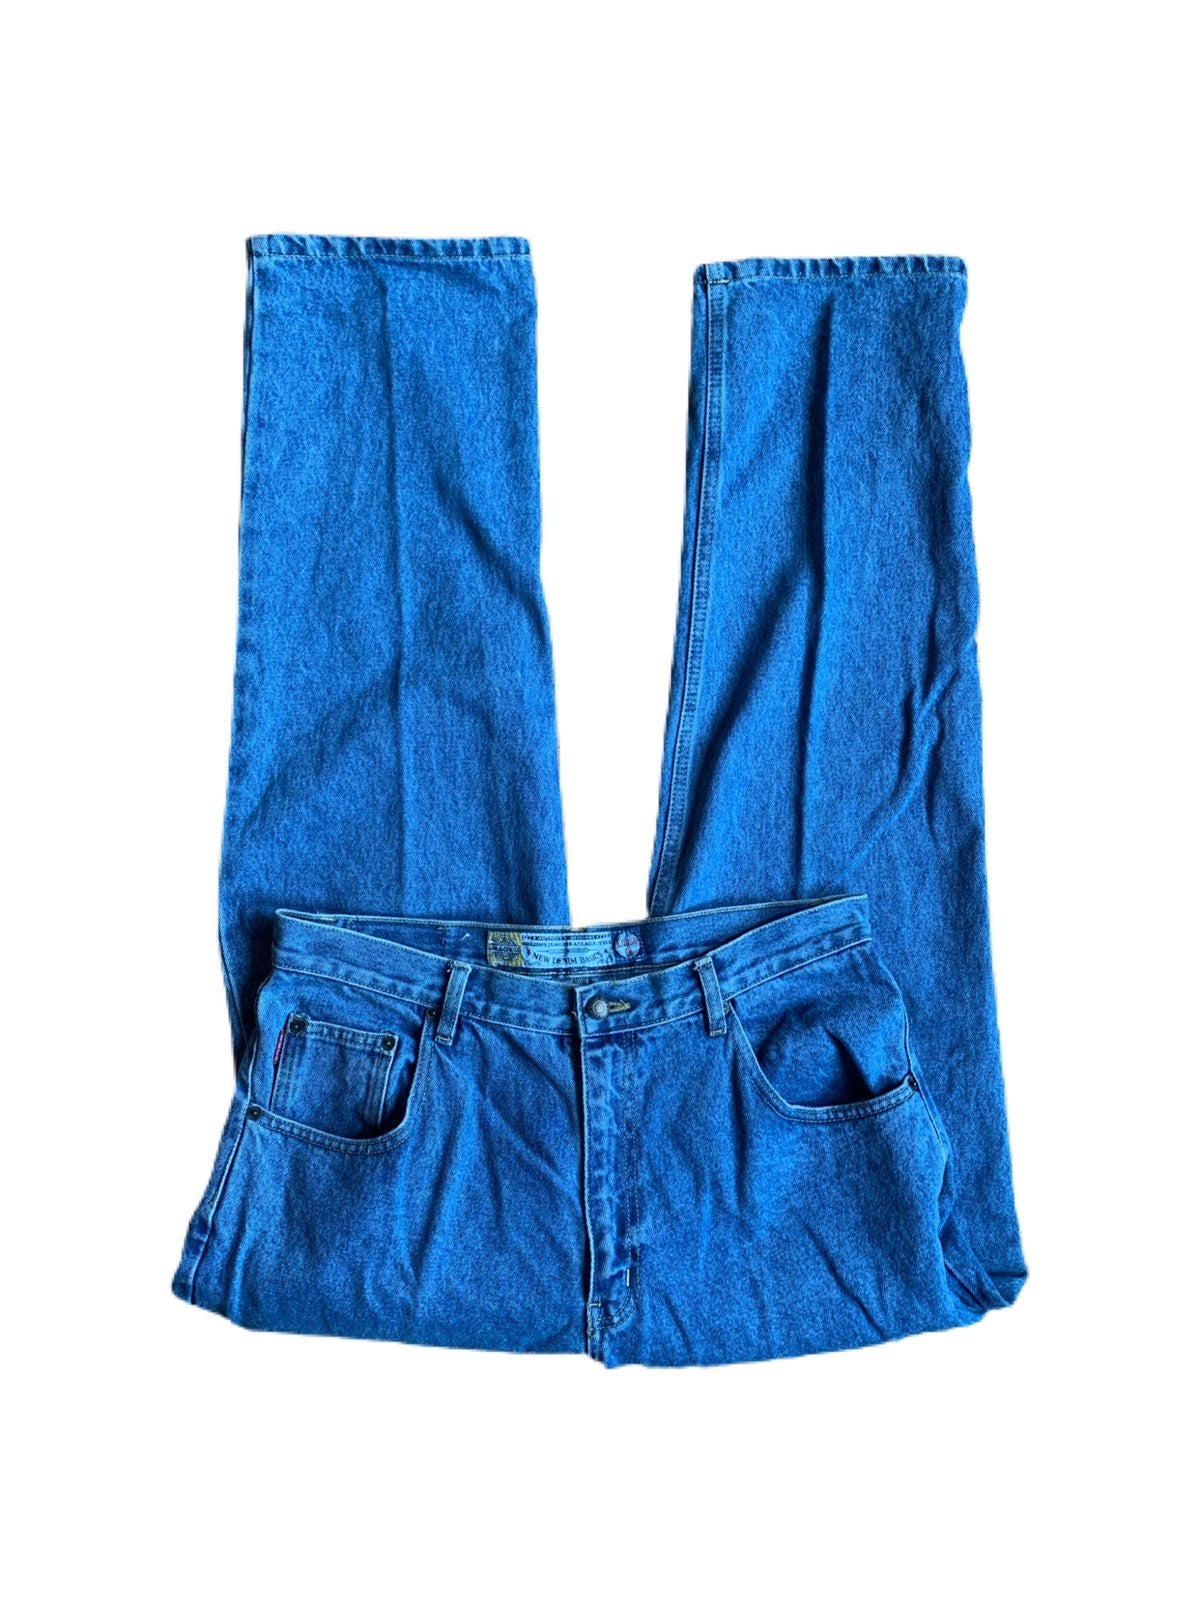 Vintage 90s Bugle Boy Loose Fit Jeans